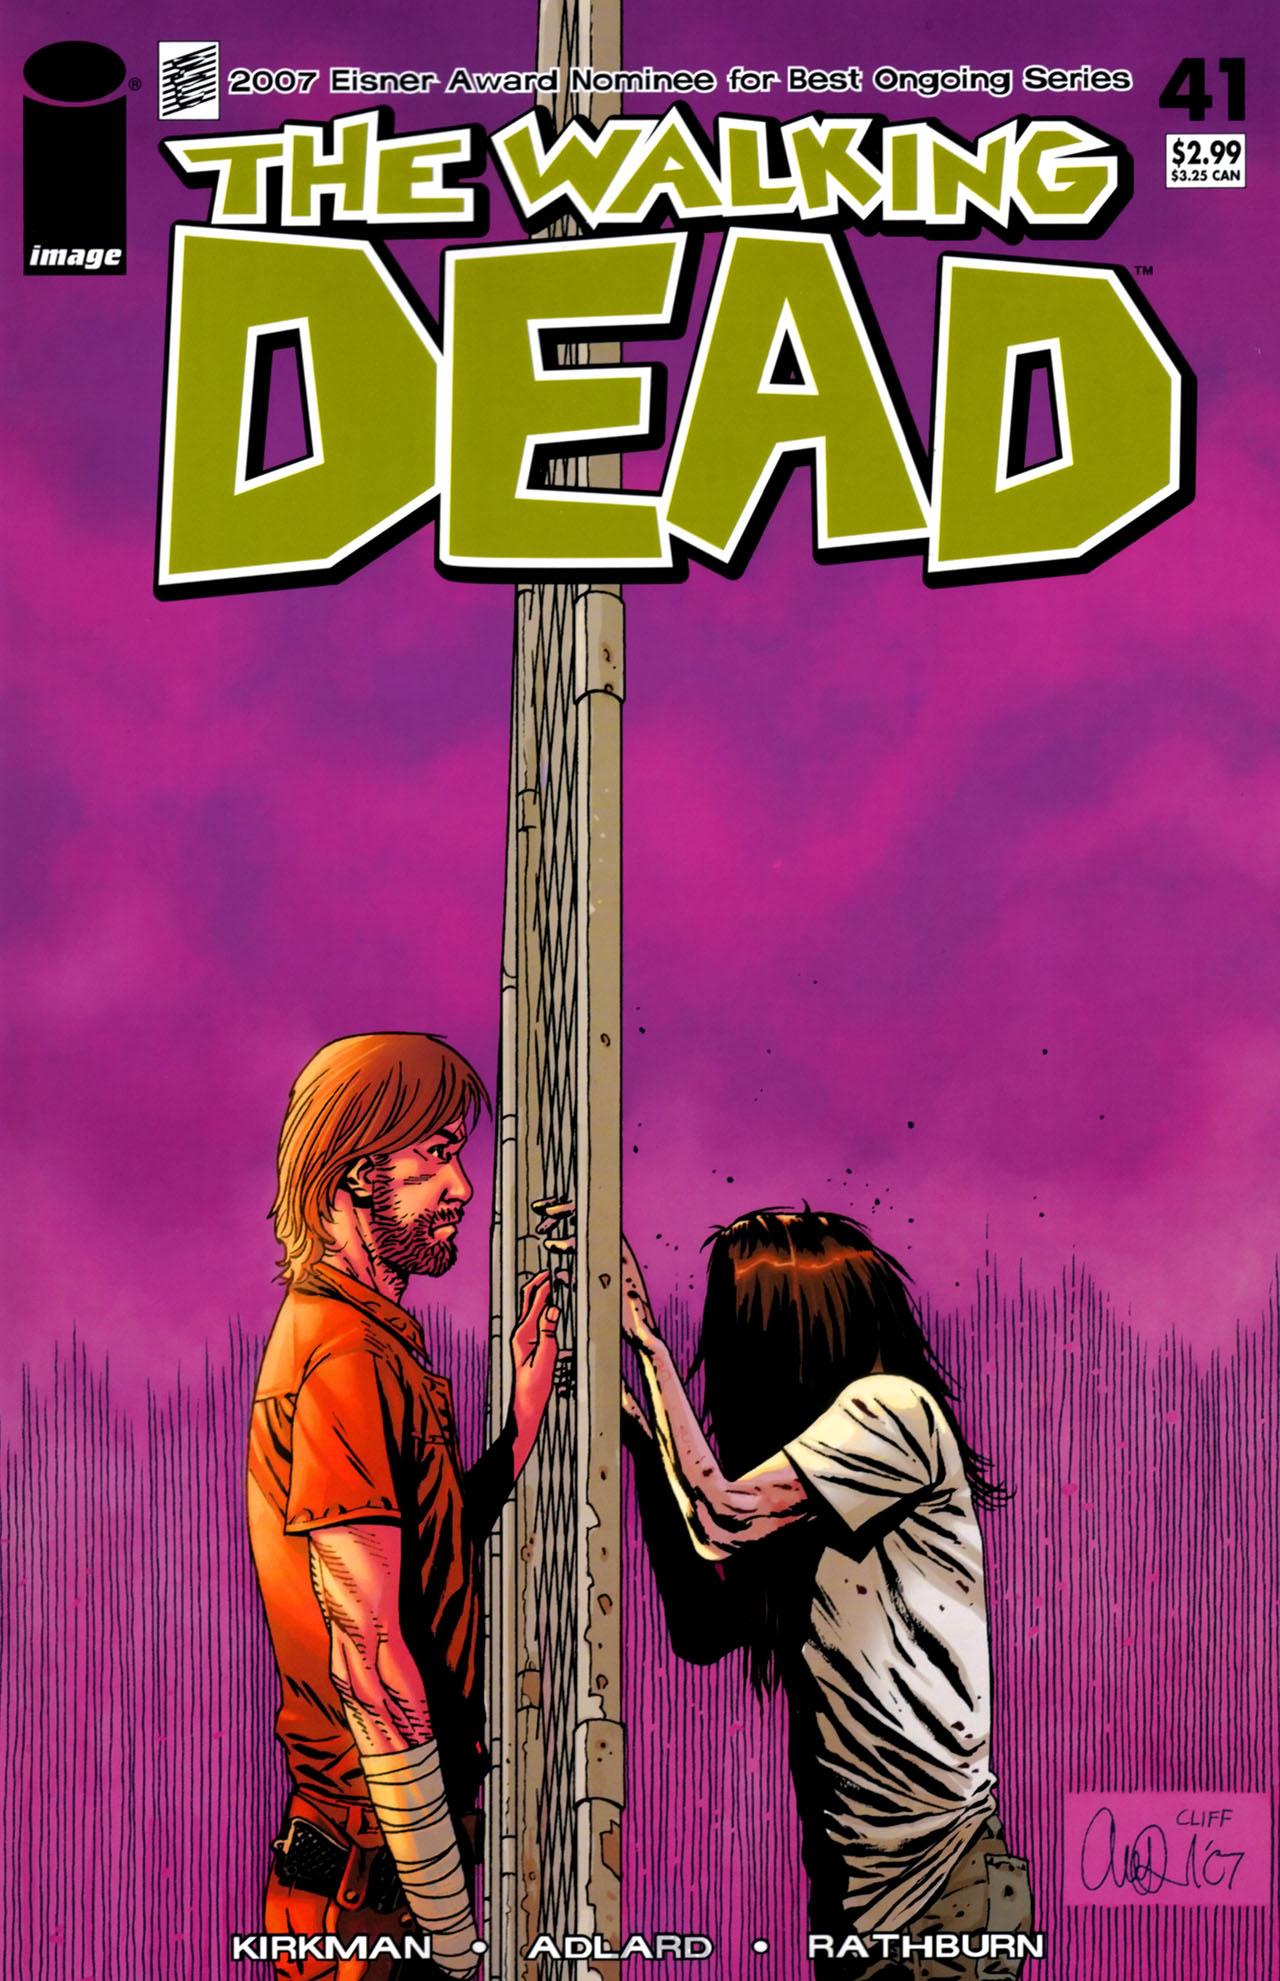 Walking Dead Sendezeit